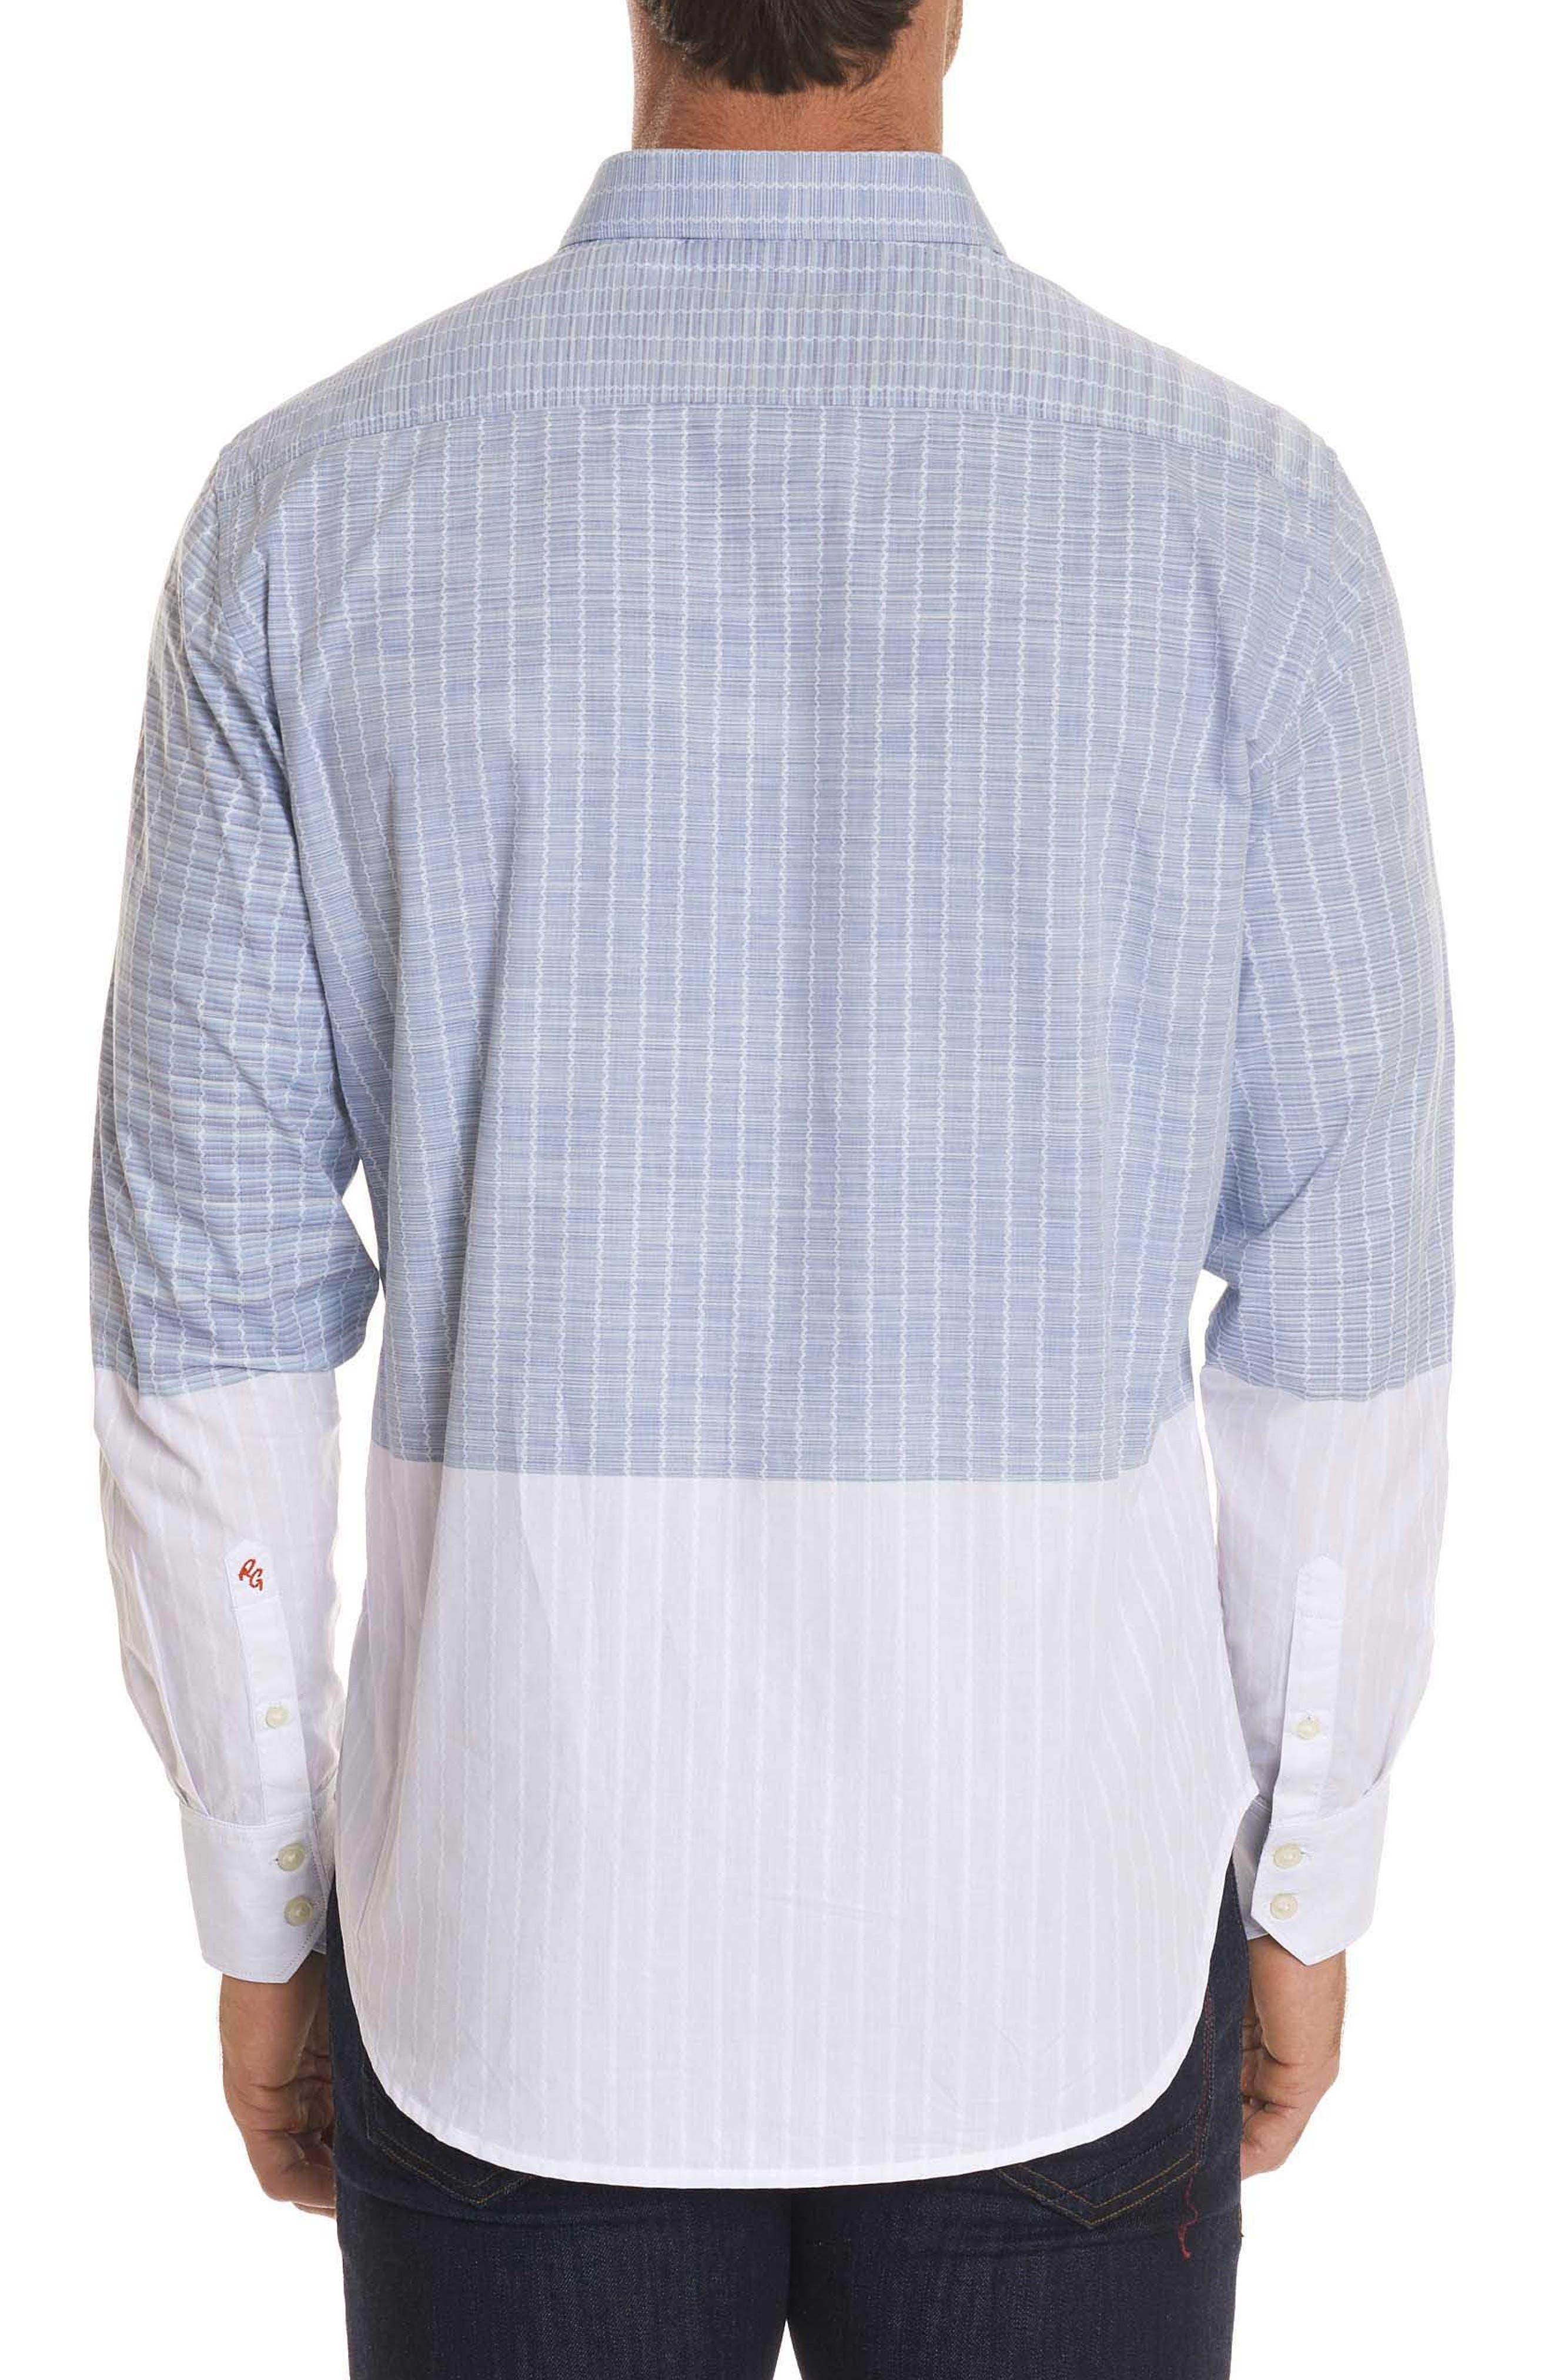 Cano Classic Fit Sport Shirt,                             Alternate thumbnail 2, color,                             400